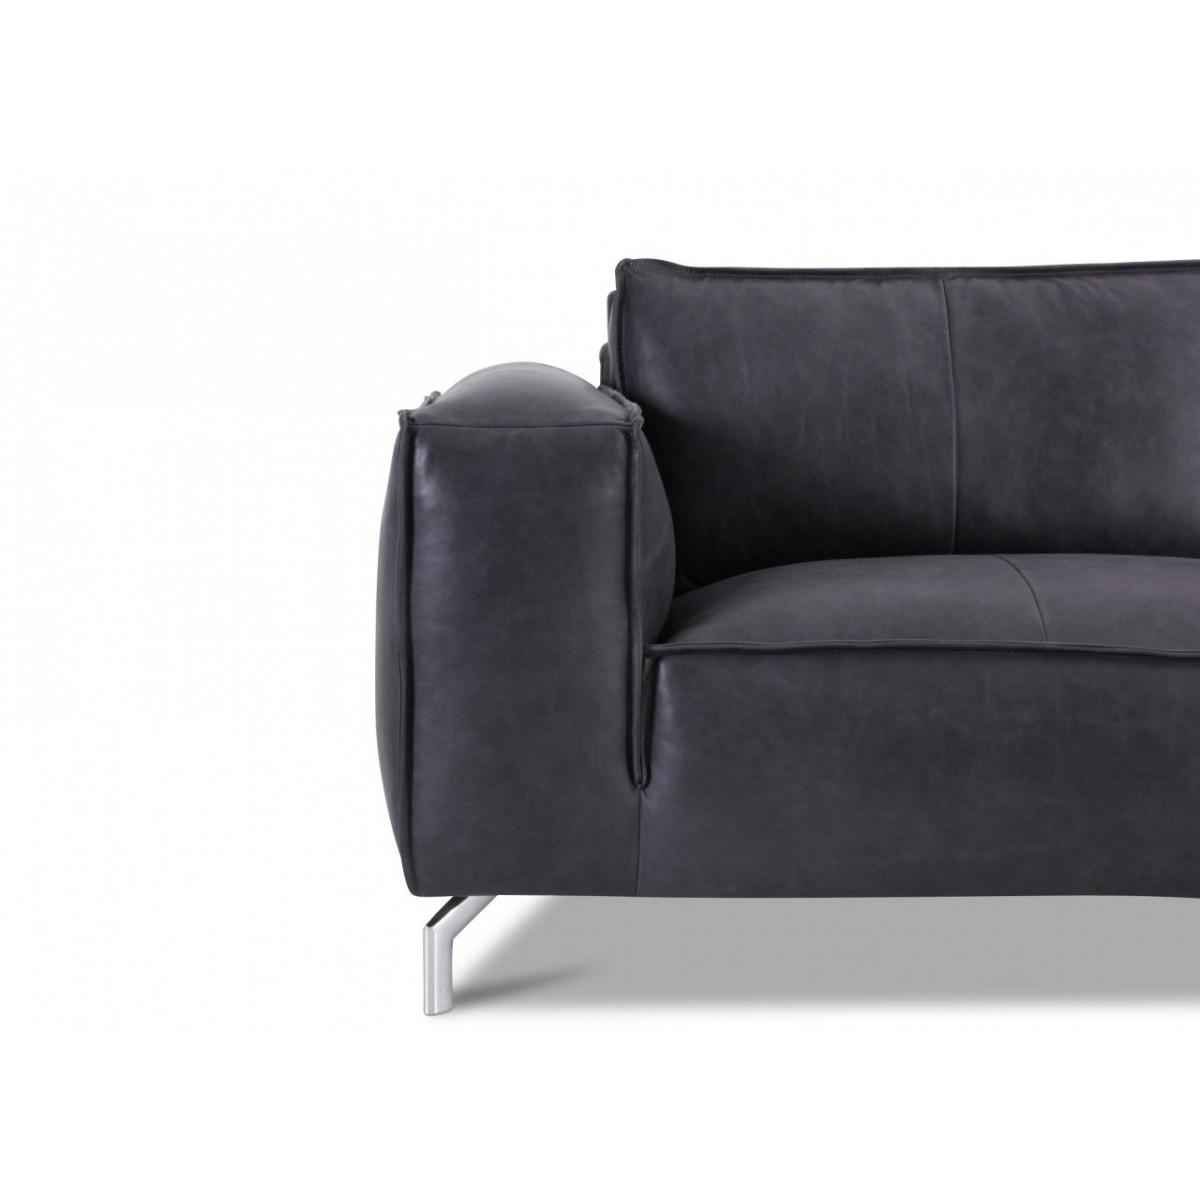 velasco-valerio-design-safo-leer-leder-dasilva-antracite